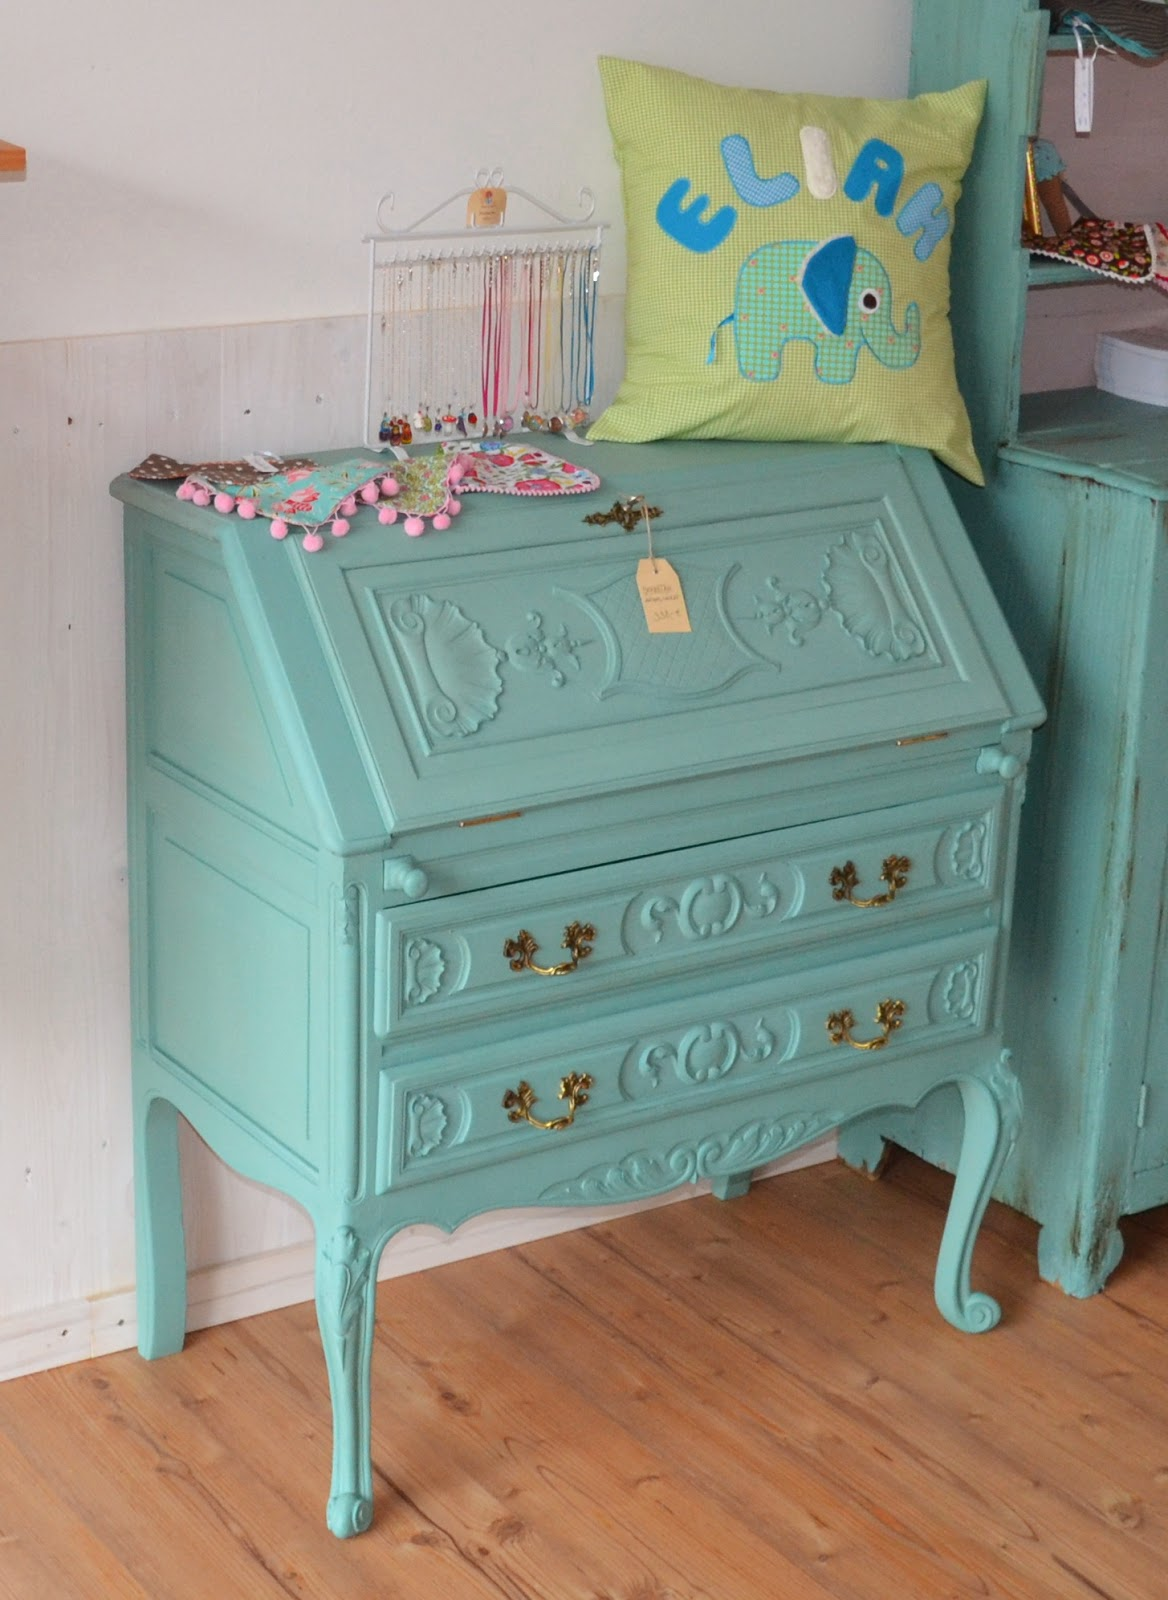 Peculiar Pixy: Vintage Möbel von Nouvelle Antique  Peculiar Pixy: ...